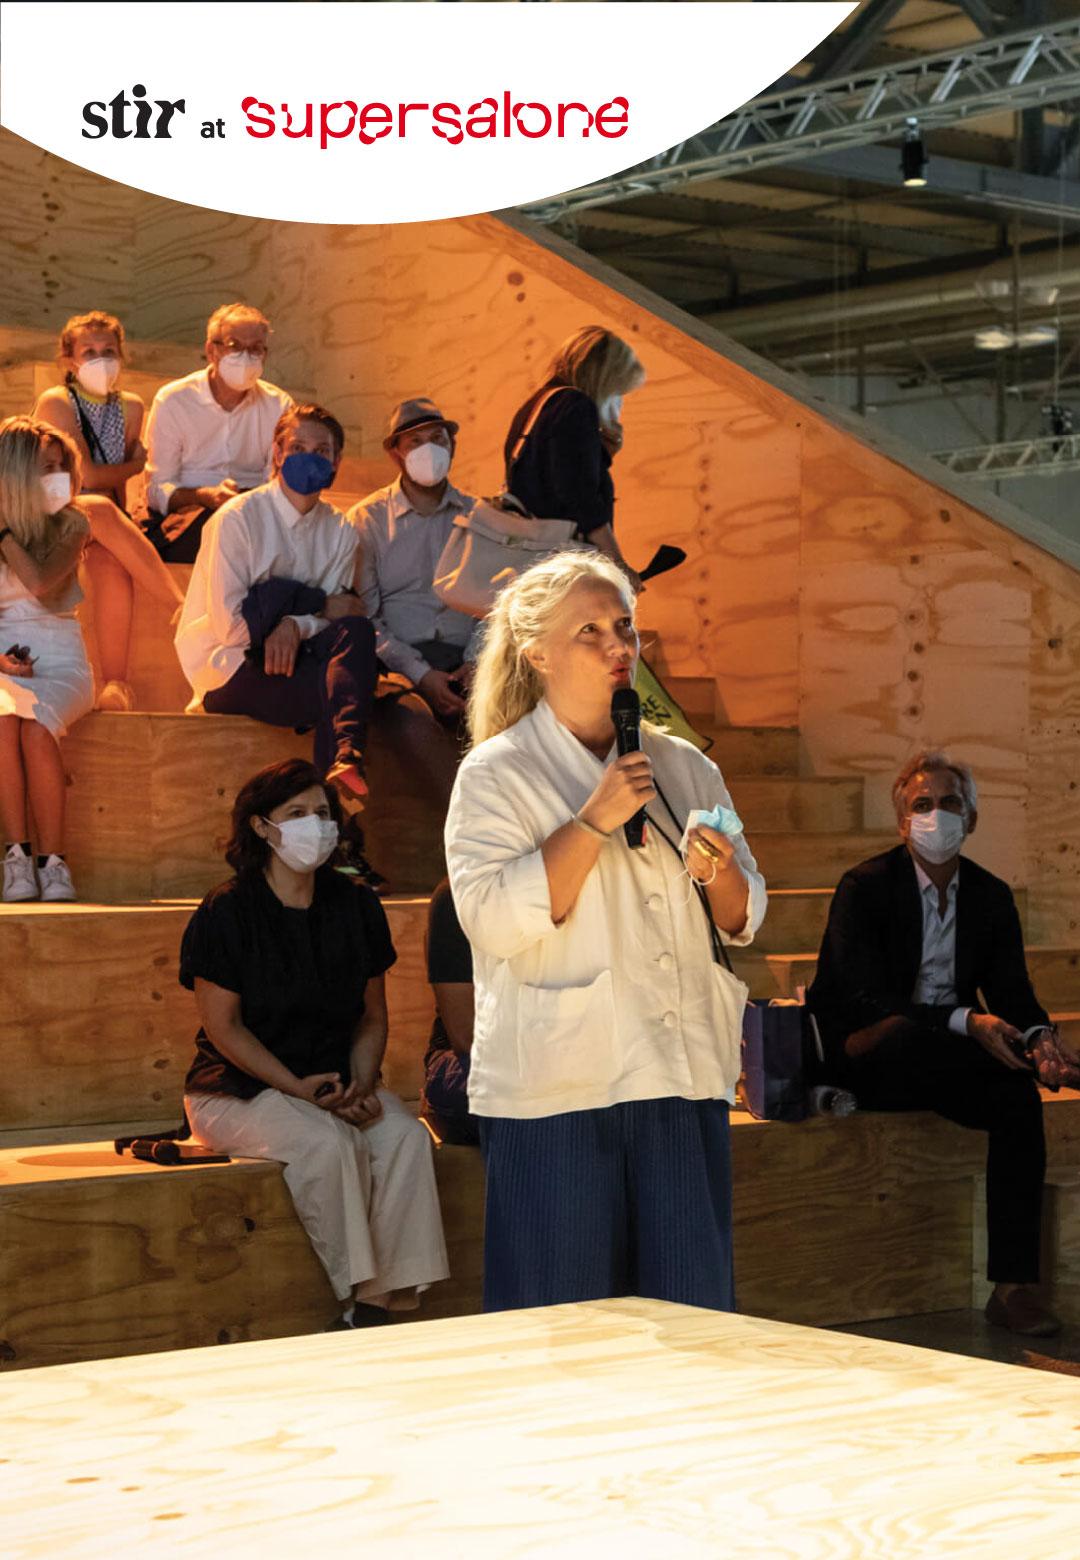 Anniina Koivu; Installation view of the Lost Graduation Show   Supersalone   Salone de mobile   Anniina Koivu  STIRworld